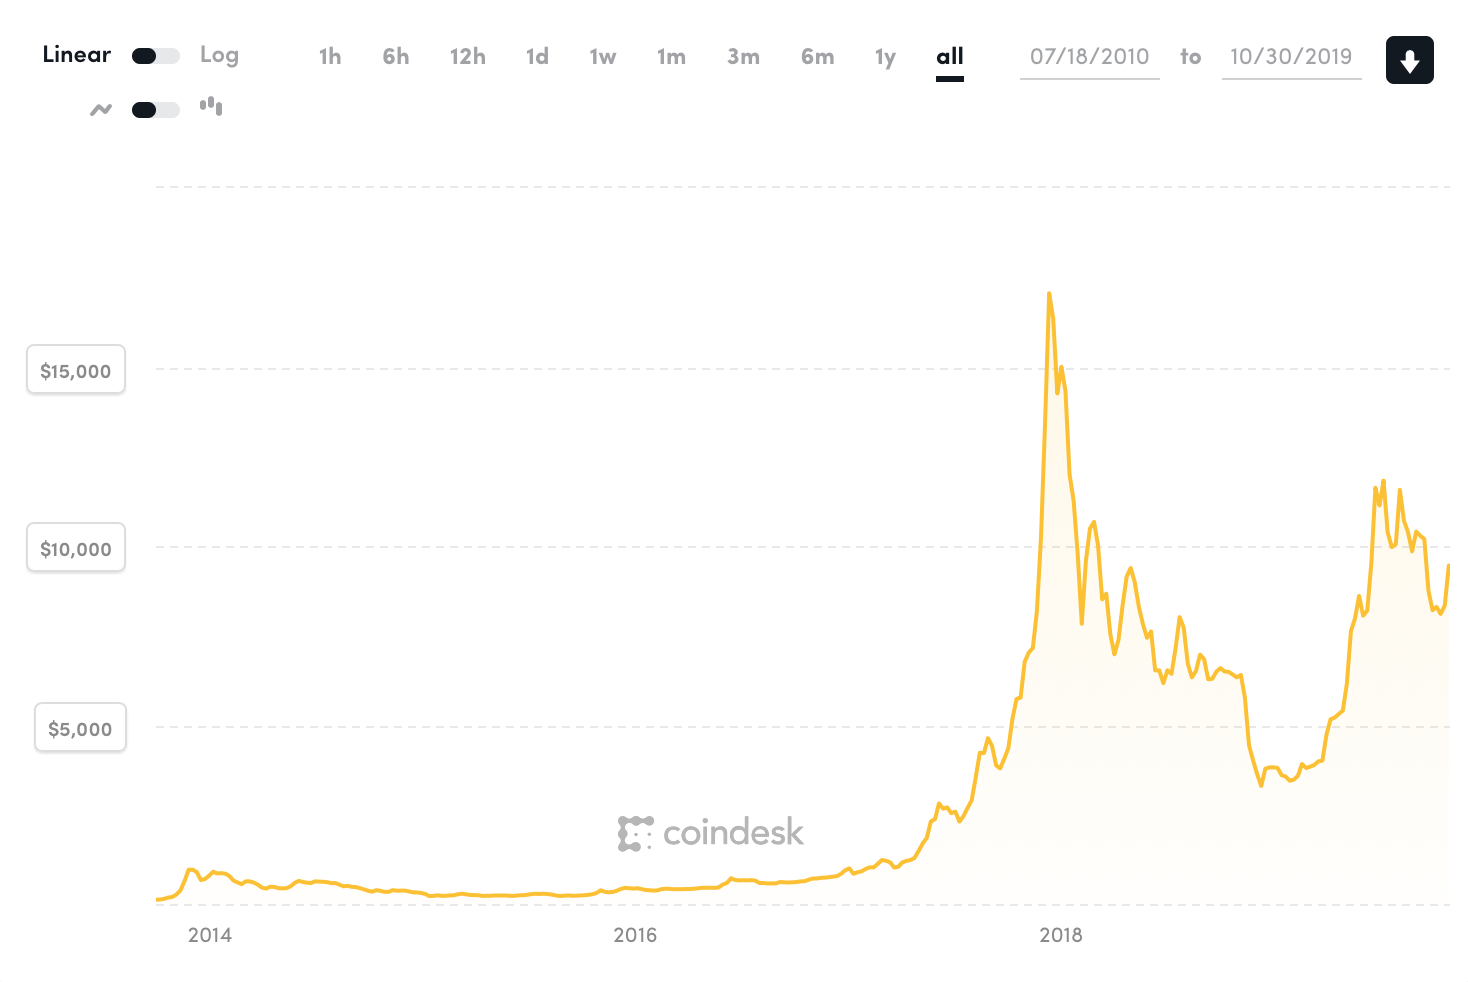 Kurz Bitcoinu od roku 2014 do roku 2019